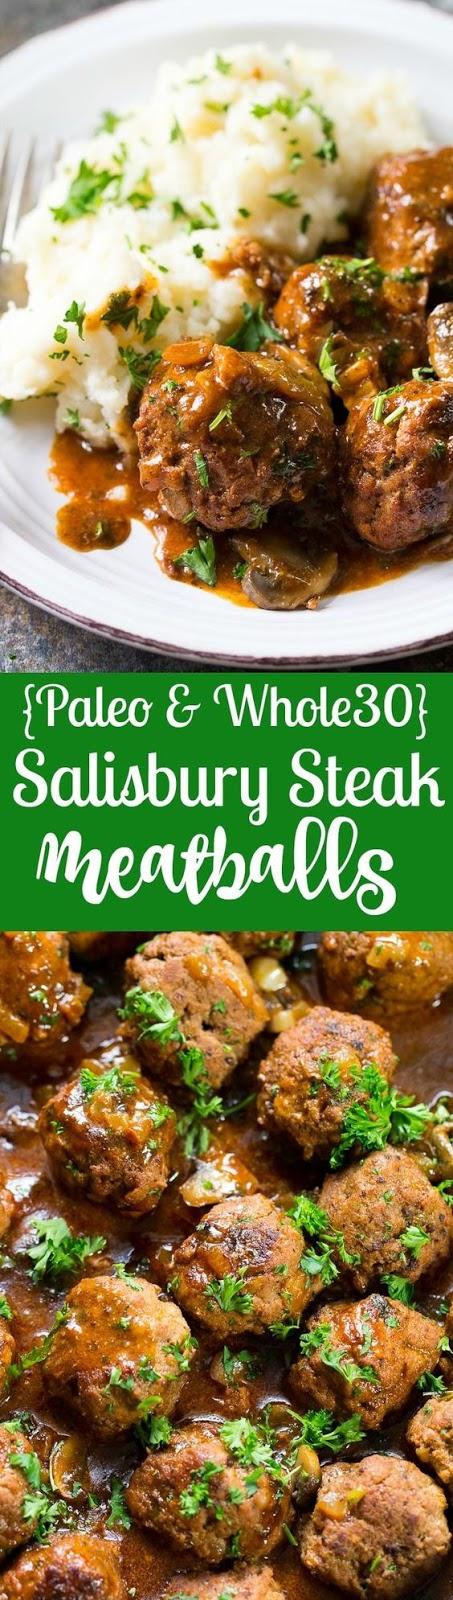 Paleo Salisbury Steak Meatballs {Whole30}